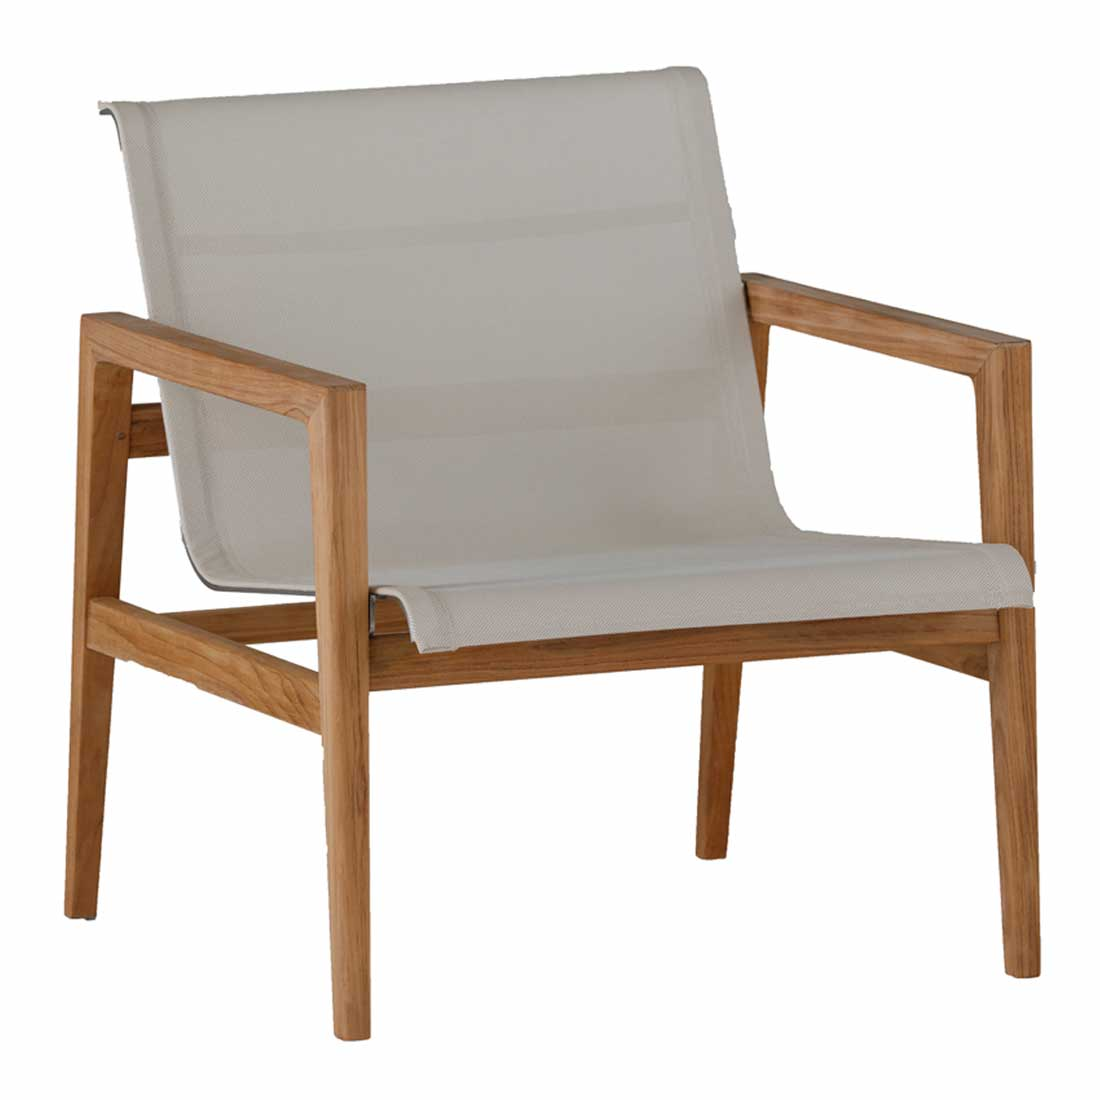 coast teak lounge chair - Dimensions: W26.75 D28 H30